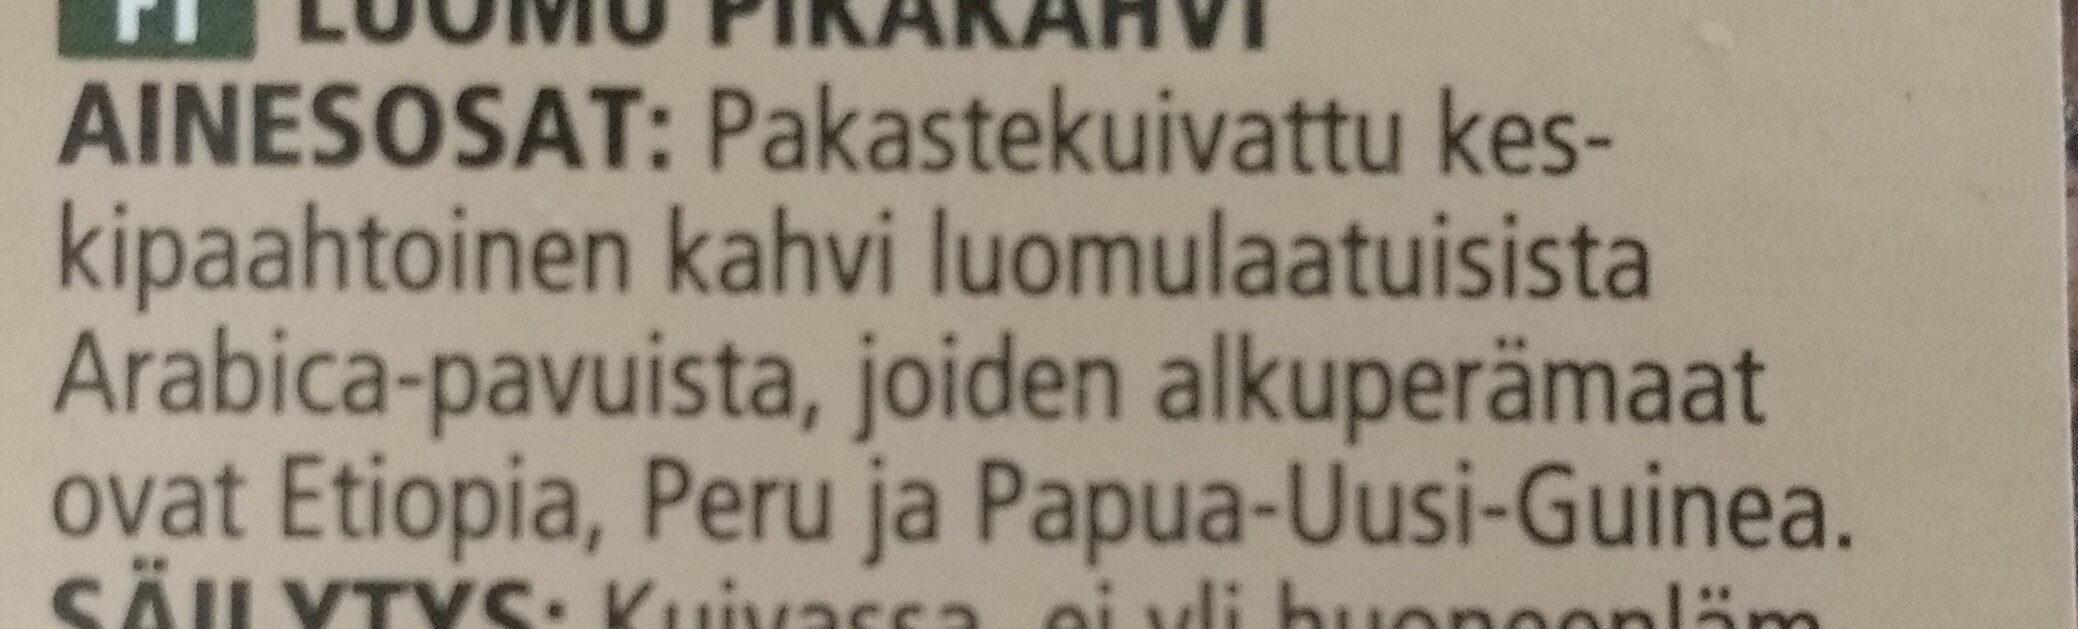 Pikakahvi Snabbkaffe - Ингредиенты - fi